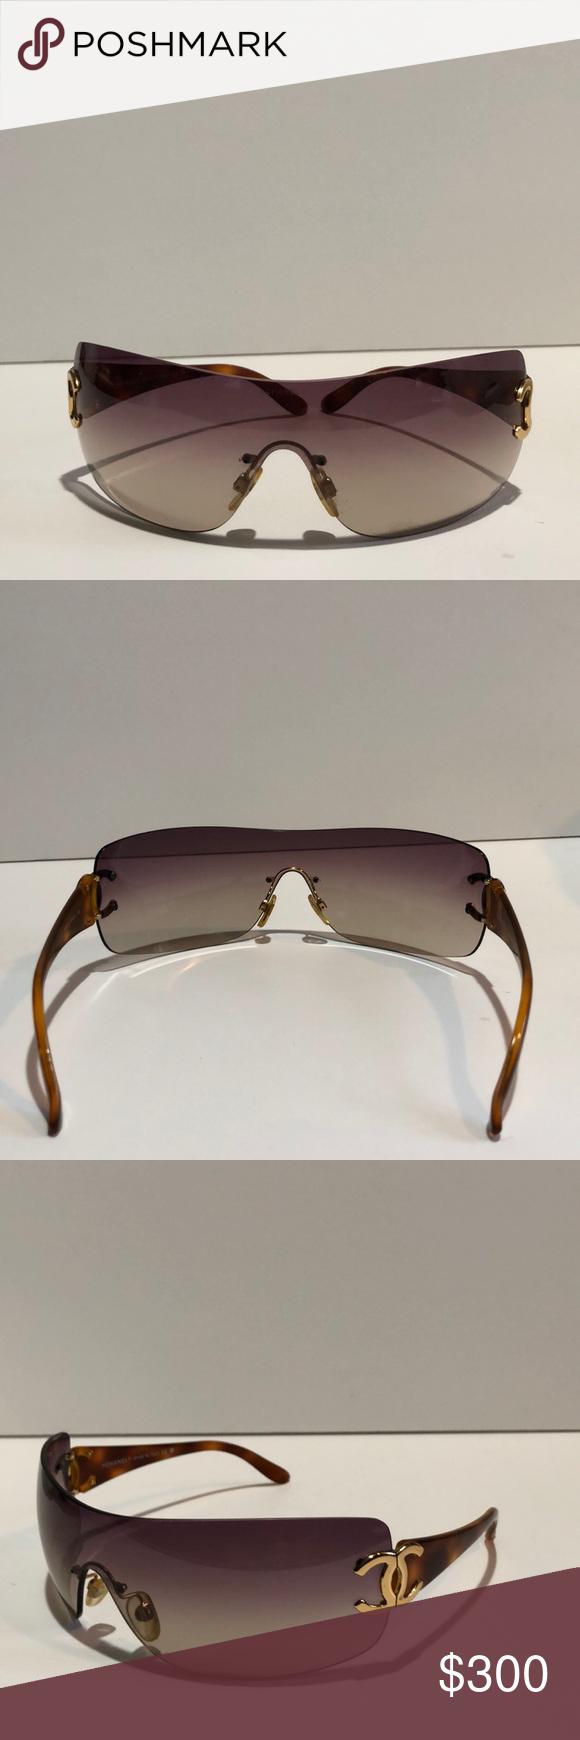 26c9c898d58a CHANEL Shield Sunglasses CHANEL Shield Sunglasses Brown Ombré Lens,  Frameless interlocking CC, and Tortoise